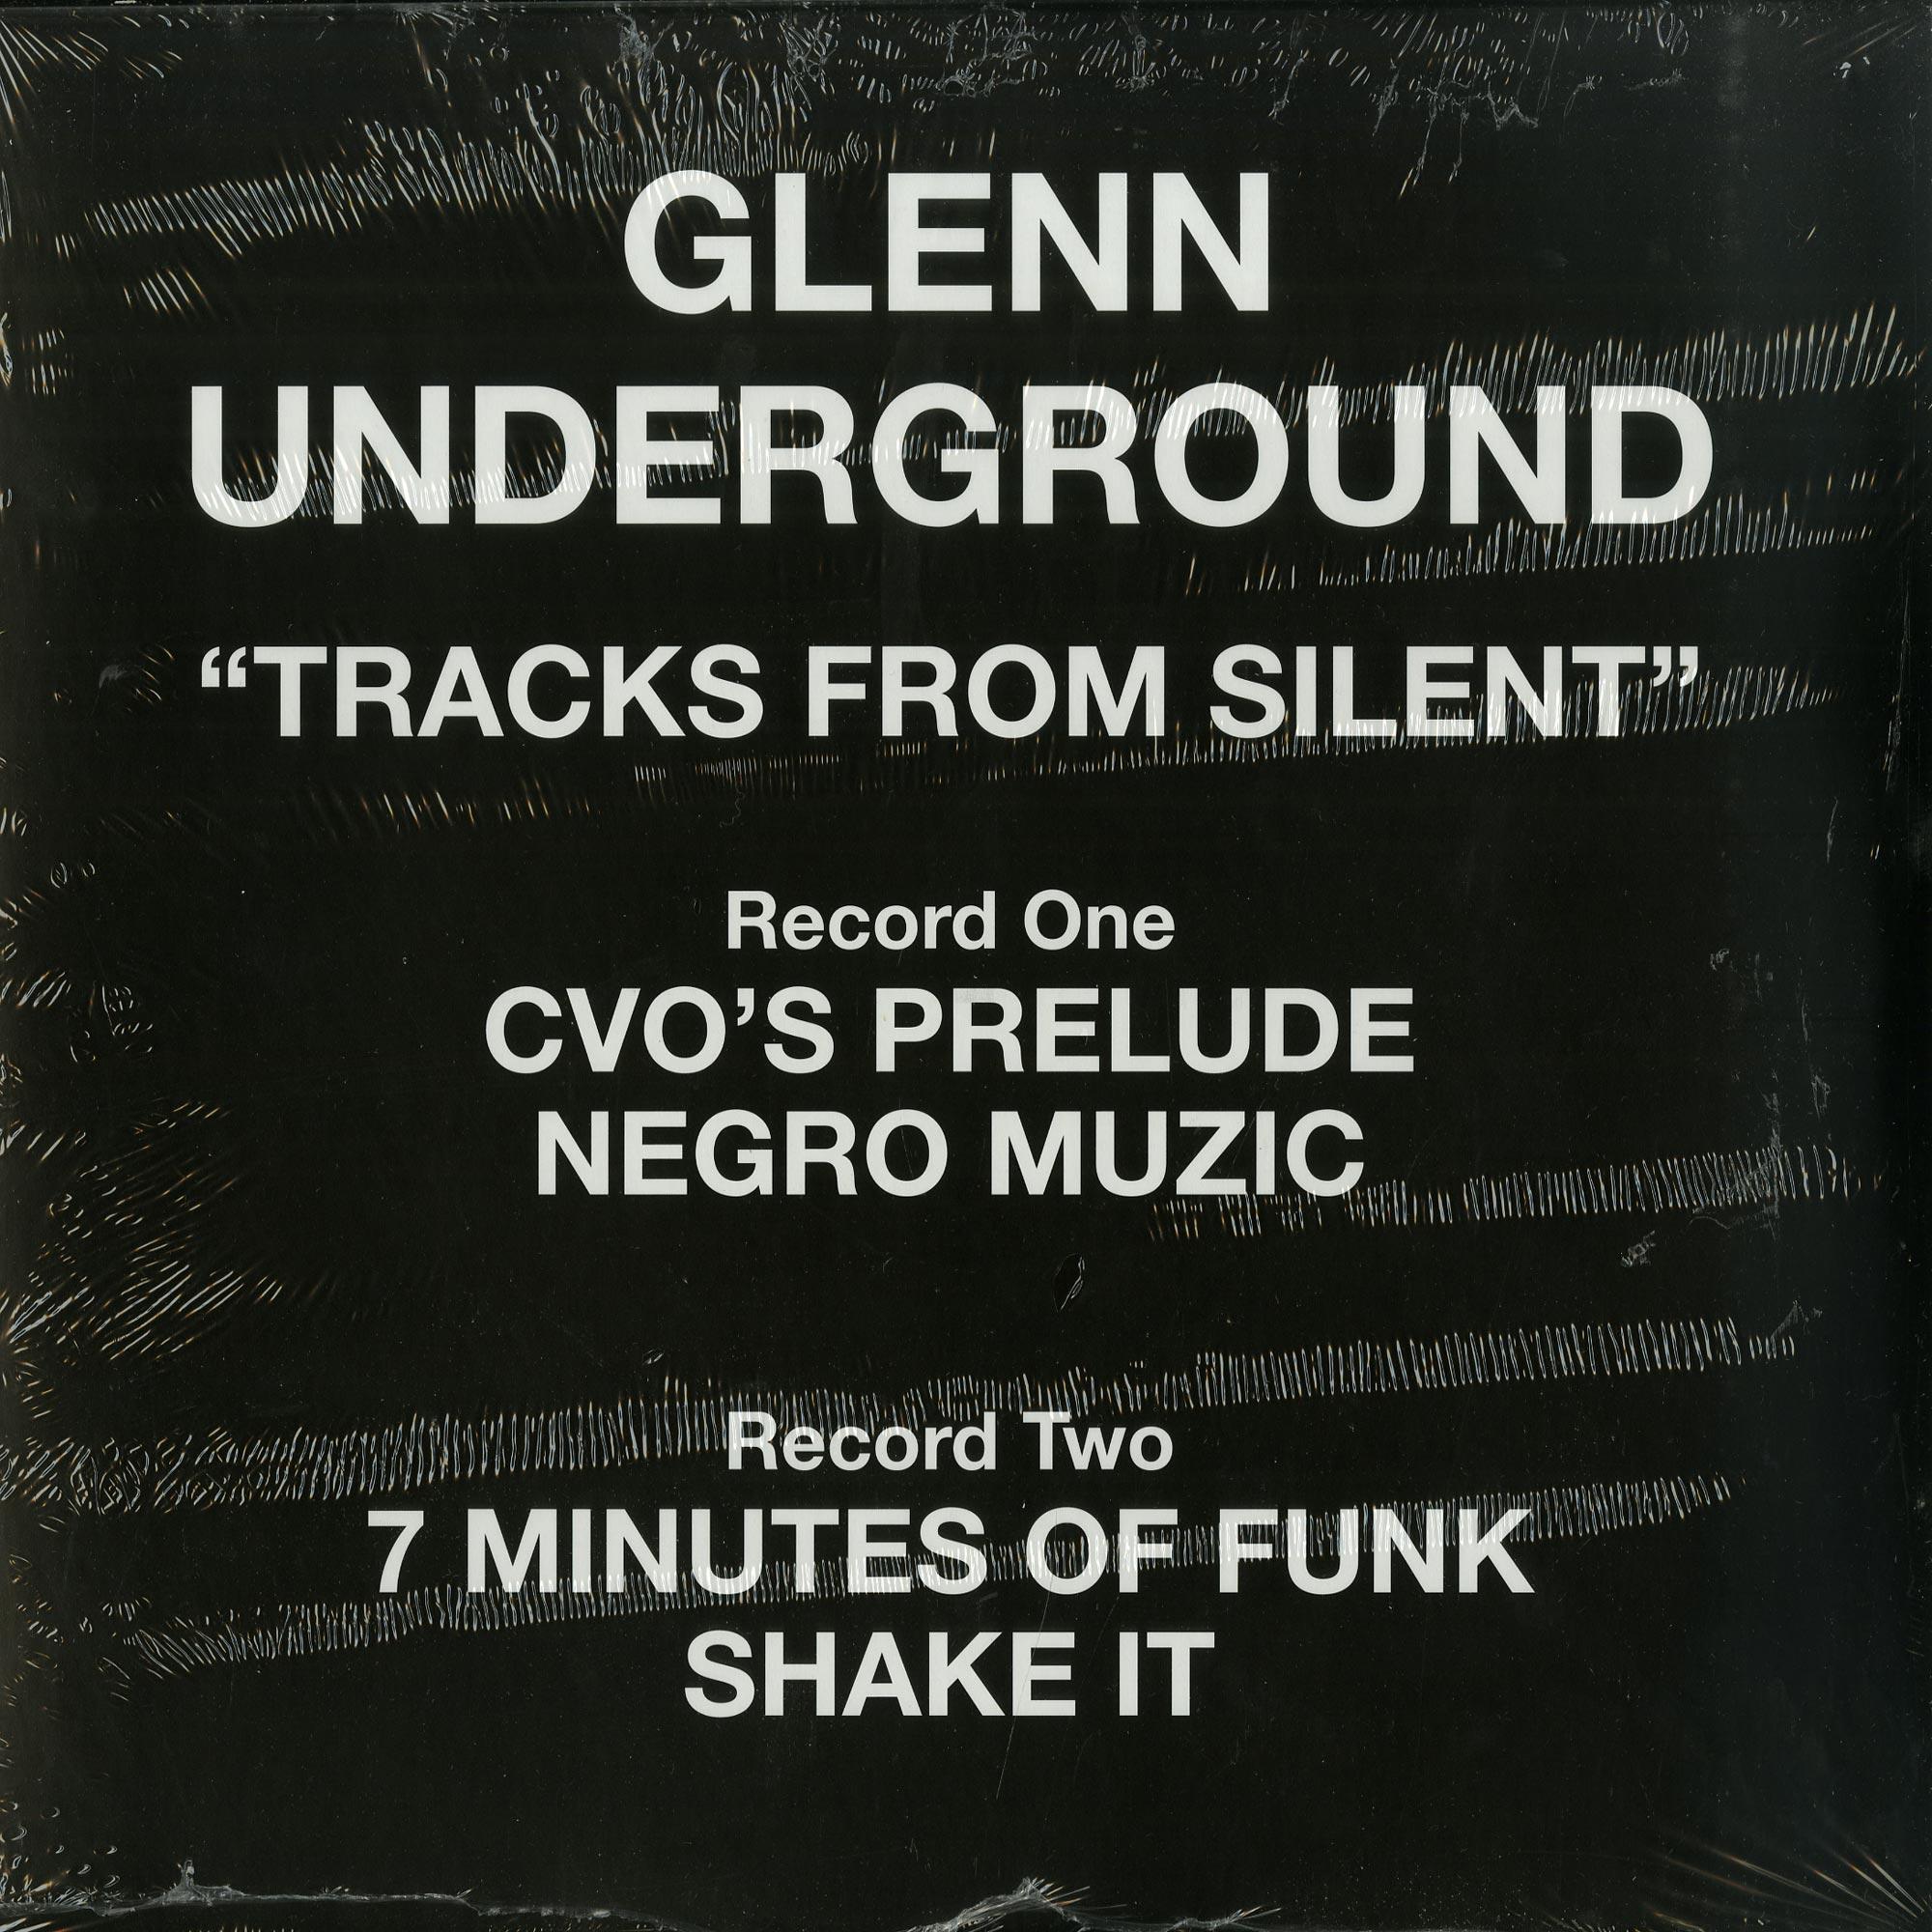 Glenn Underground - TRACKS FROM SILENT